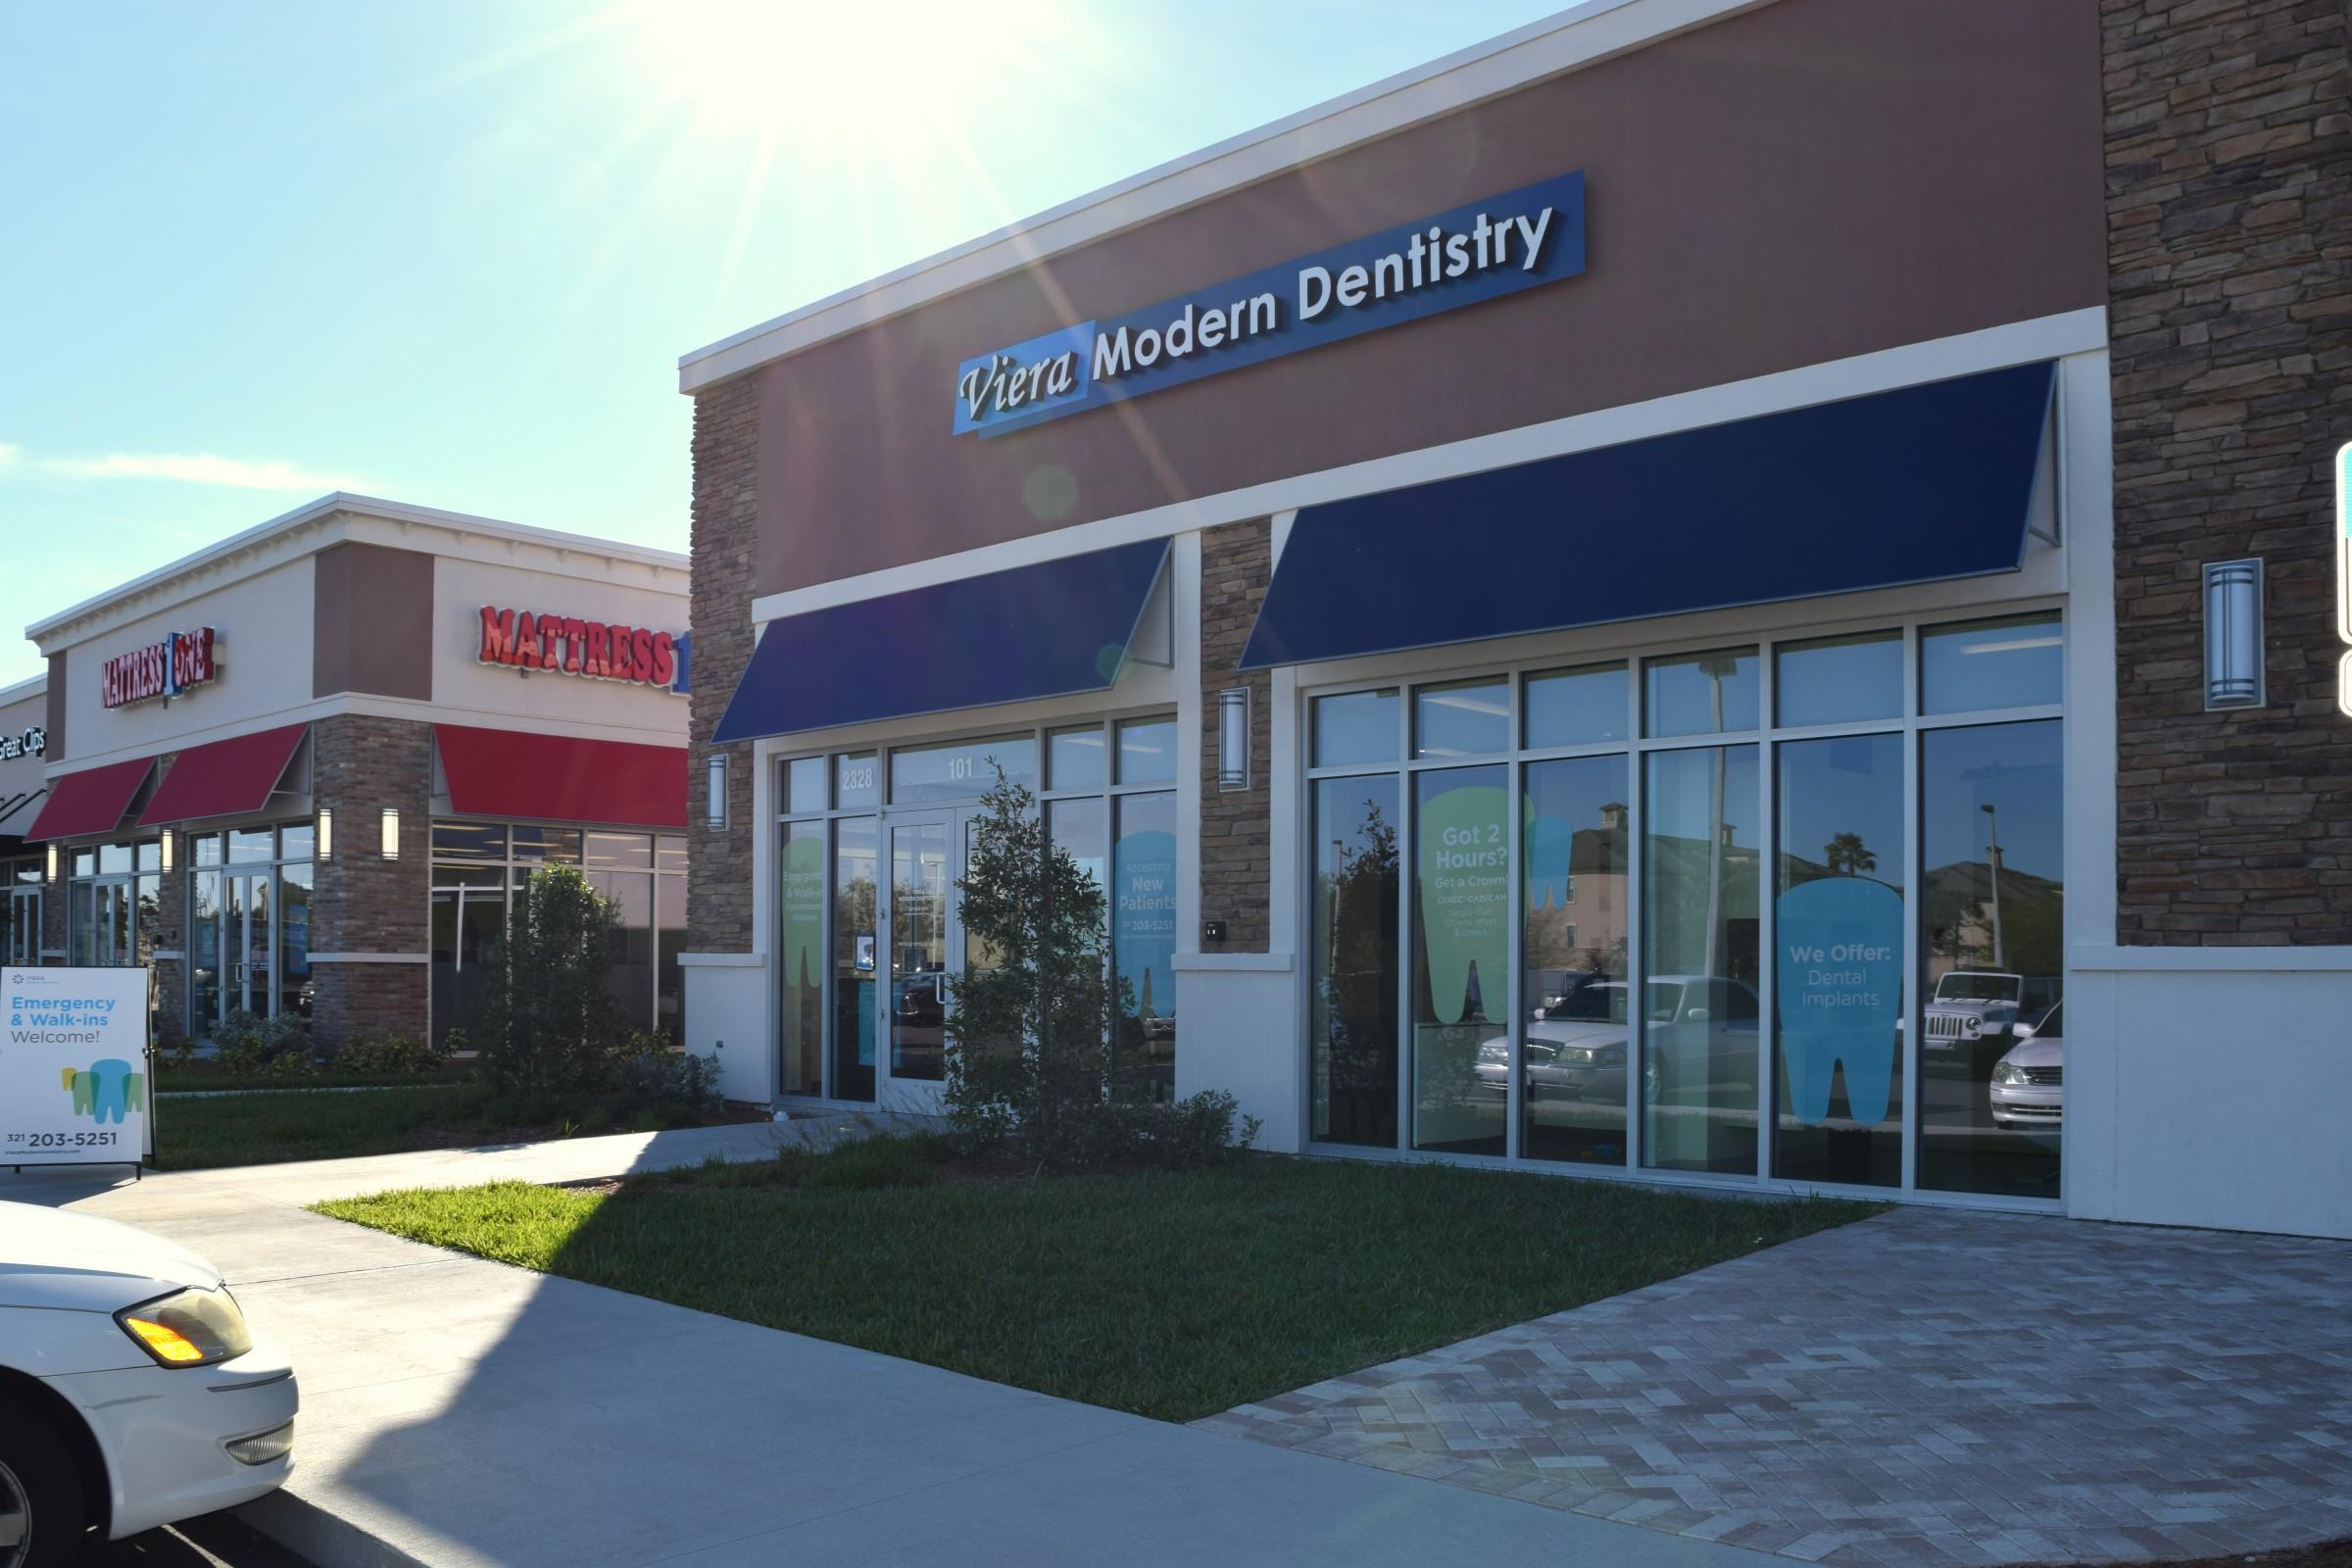 Viera Modern Dentistry image 1